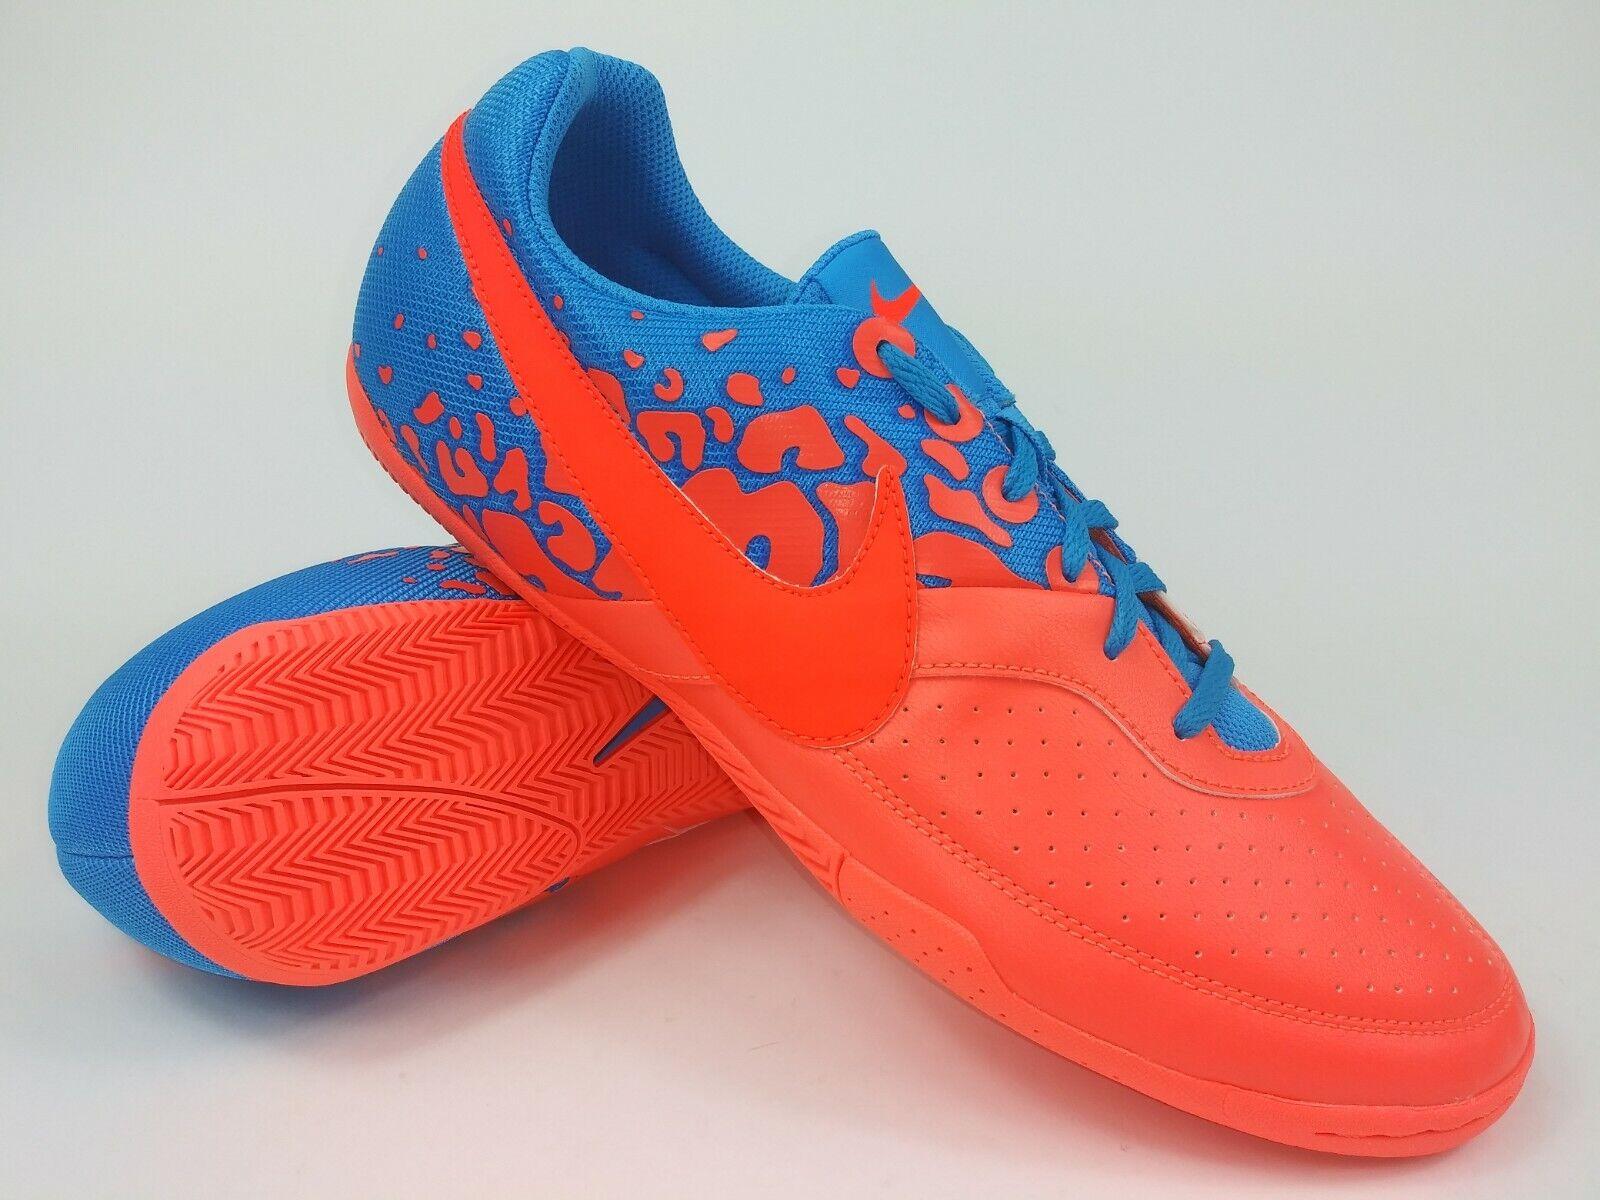 Nike señores raramente elastico II interior-fútbol zapatos 580454-884 mango